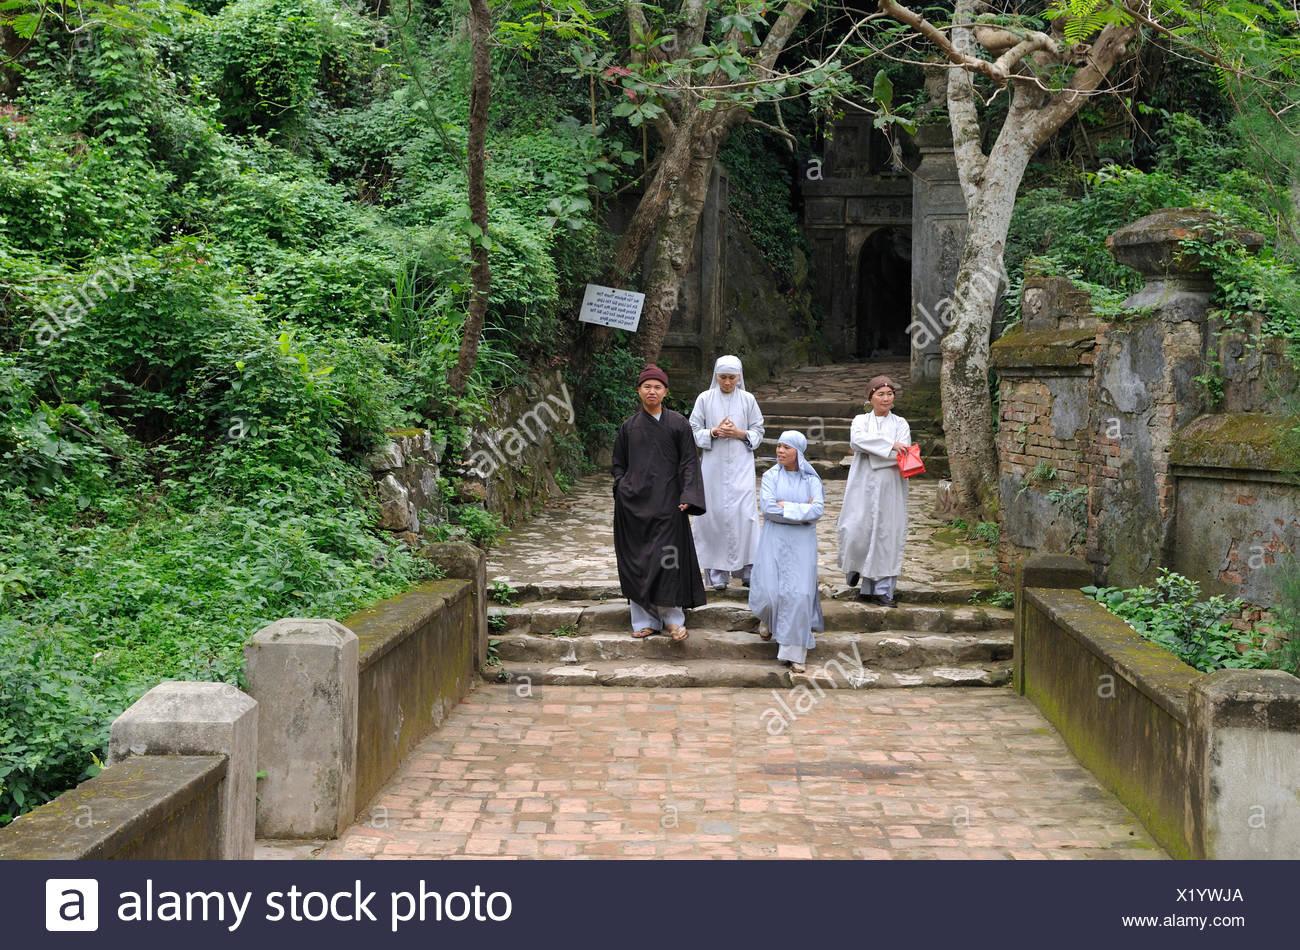 Buddhist nuns and monk at the Huyen Khong Cave, Marble Mountains or Ngu Hanh Son, Thuy Son, Da Nang, Vietnam, Asia - Stock Image